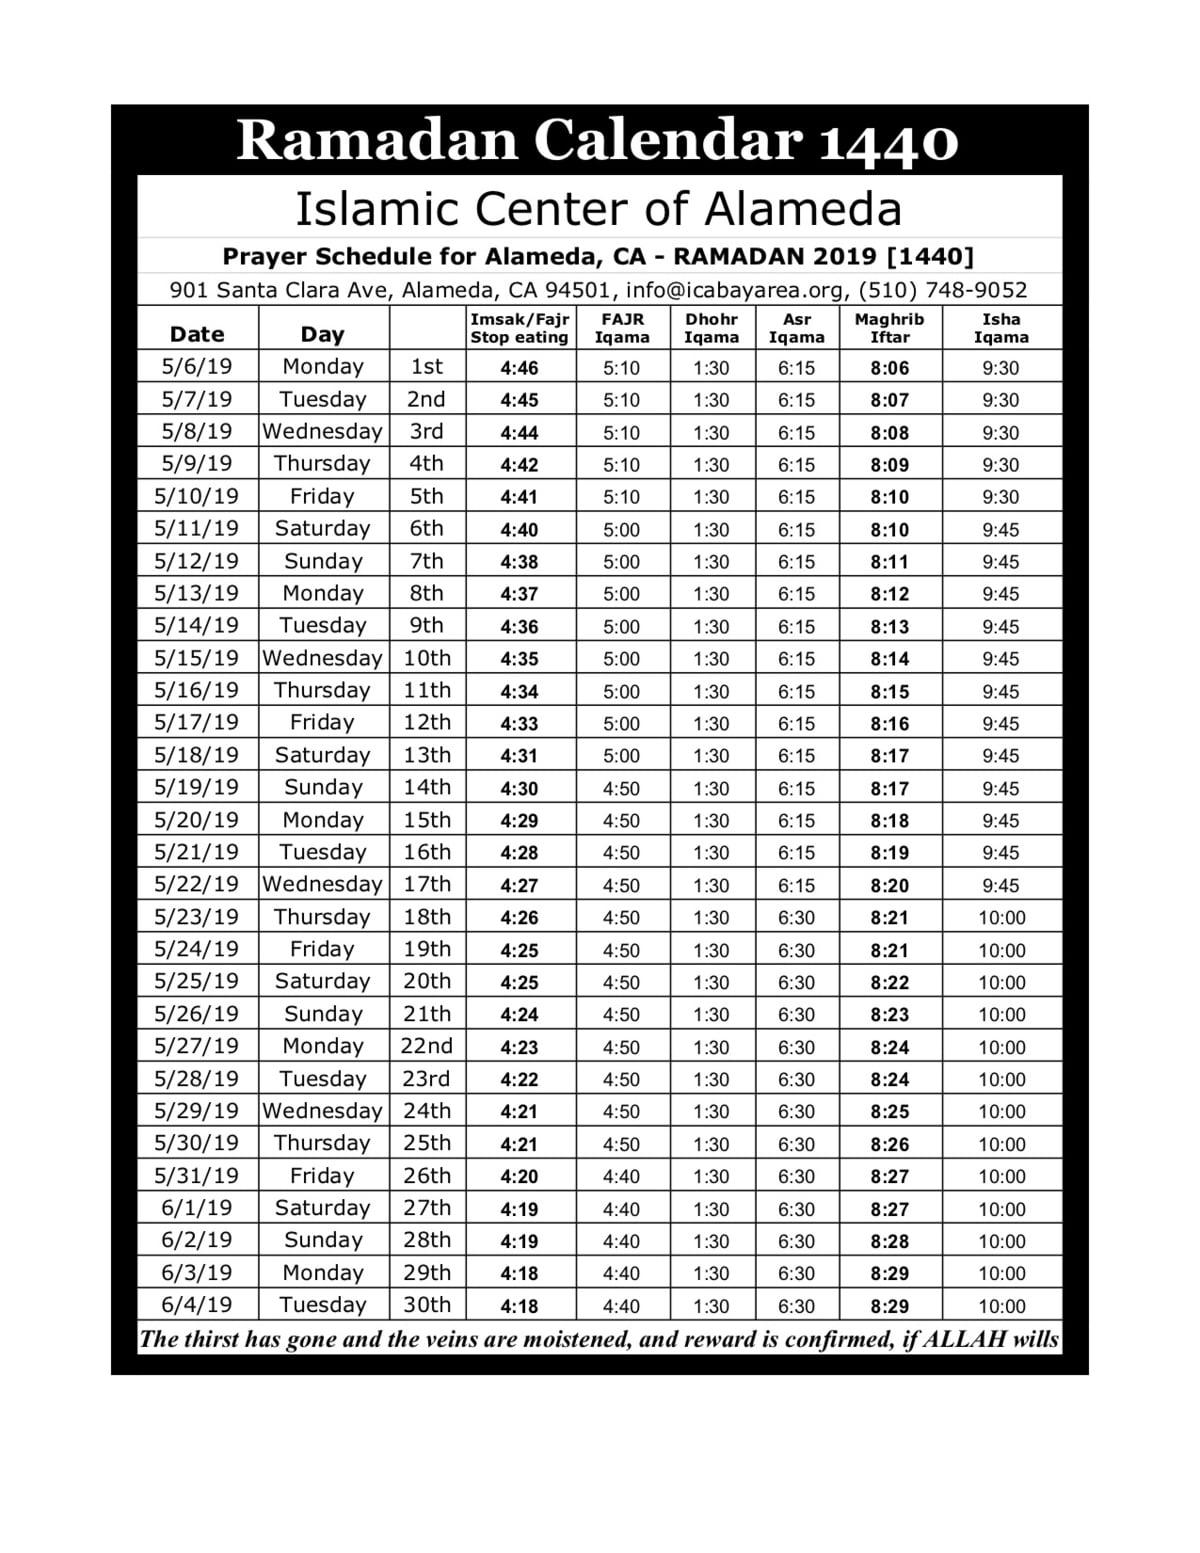 Ramadan Calander 2019 - ICA Ramadan 2019.jpg